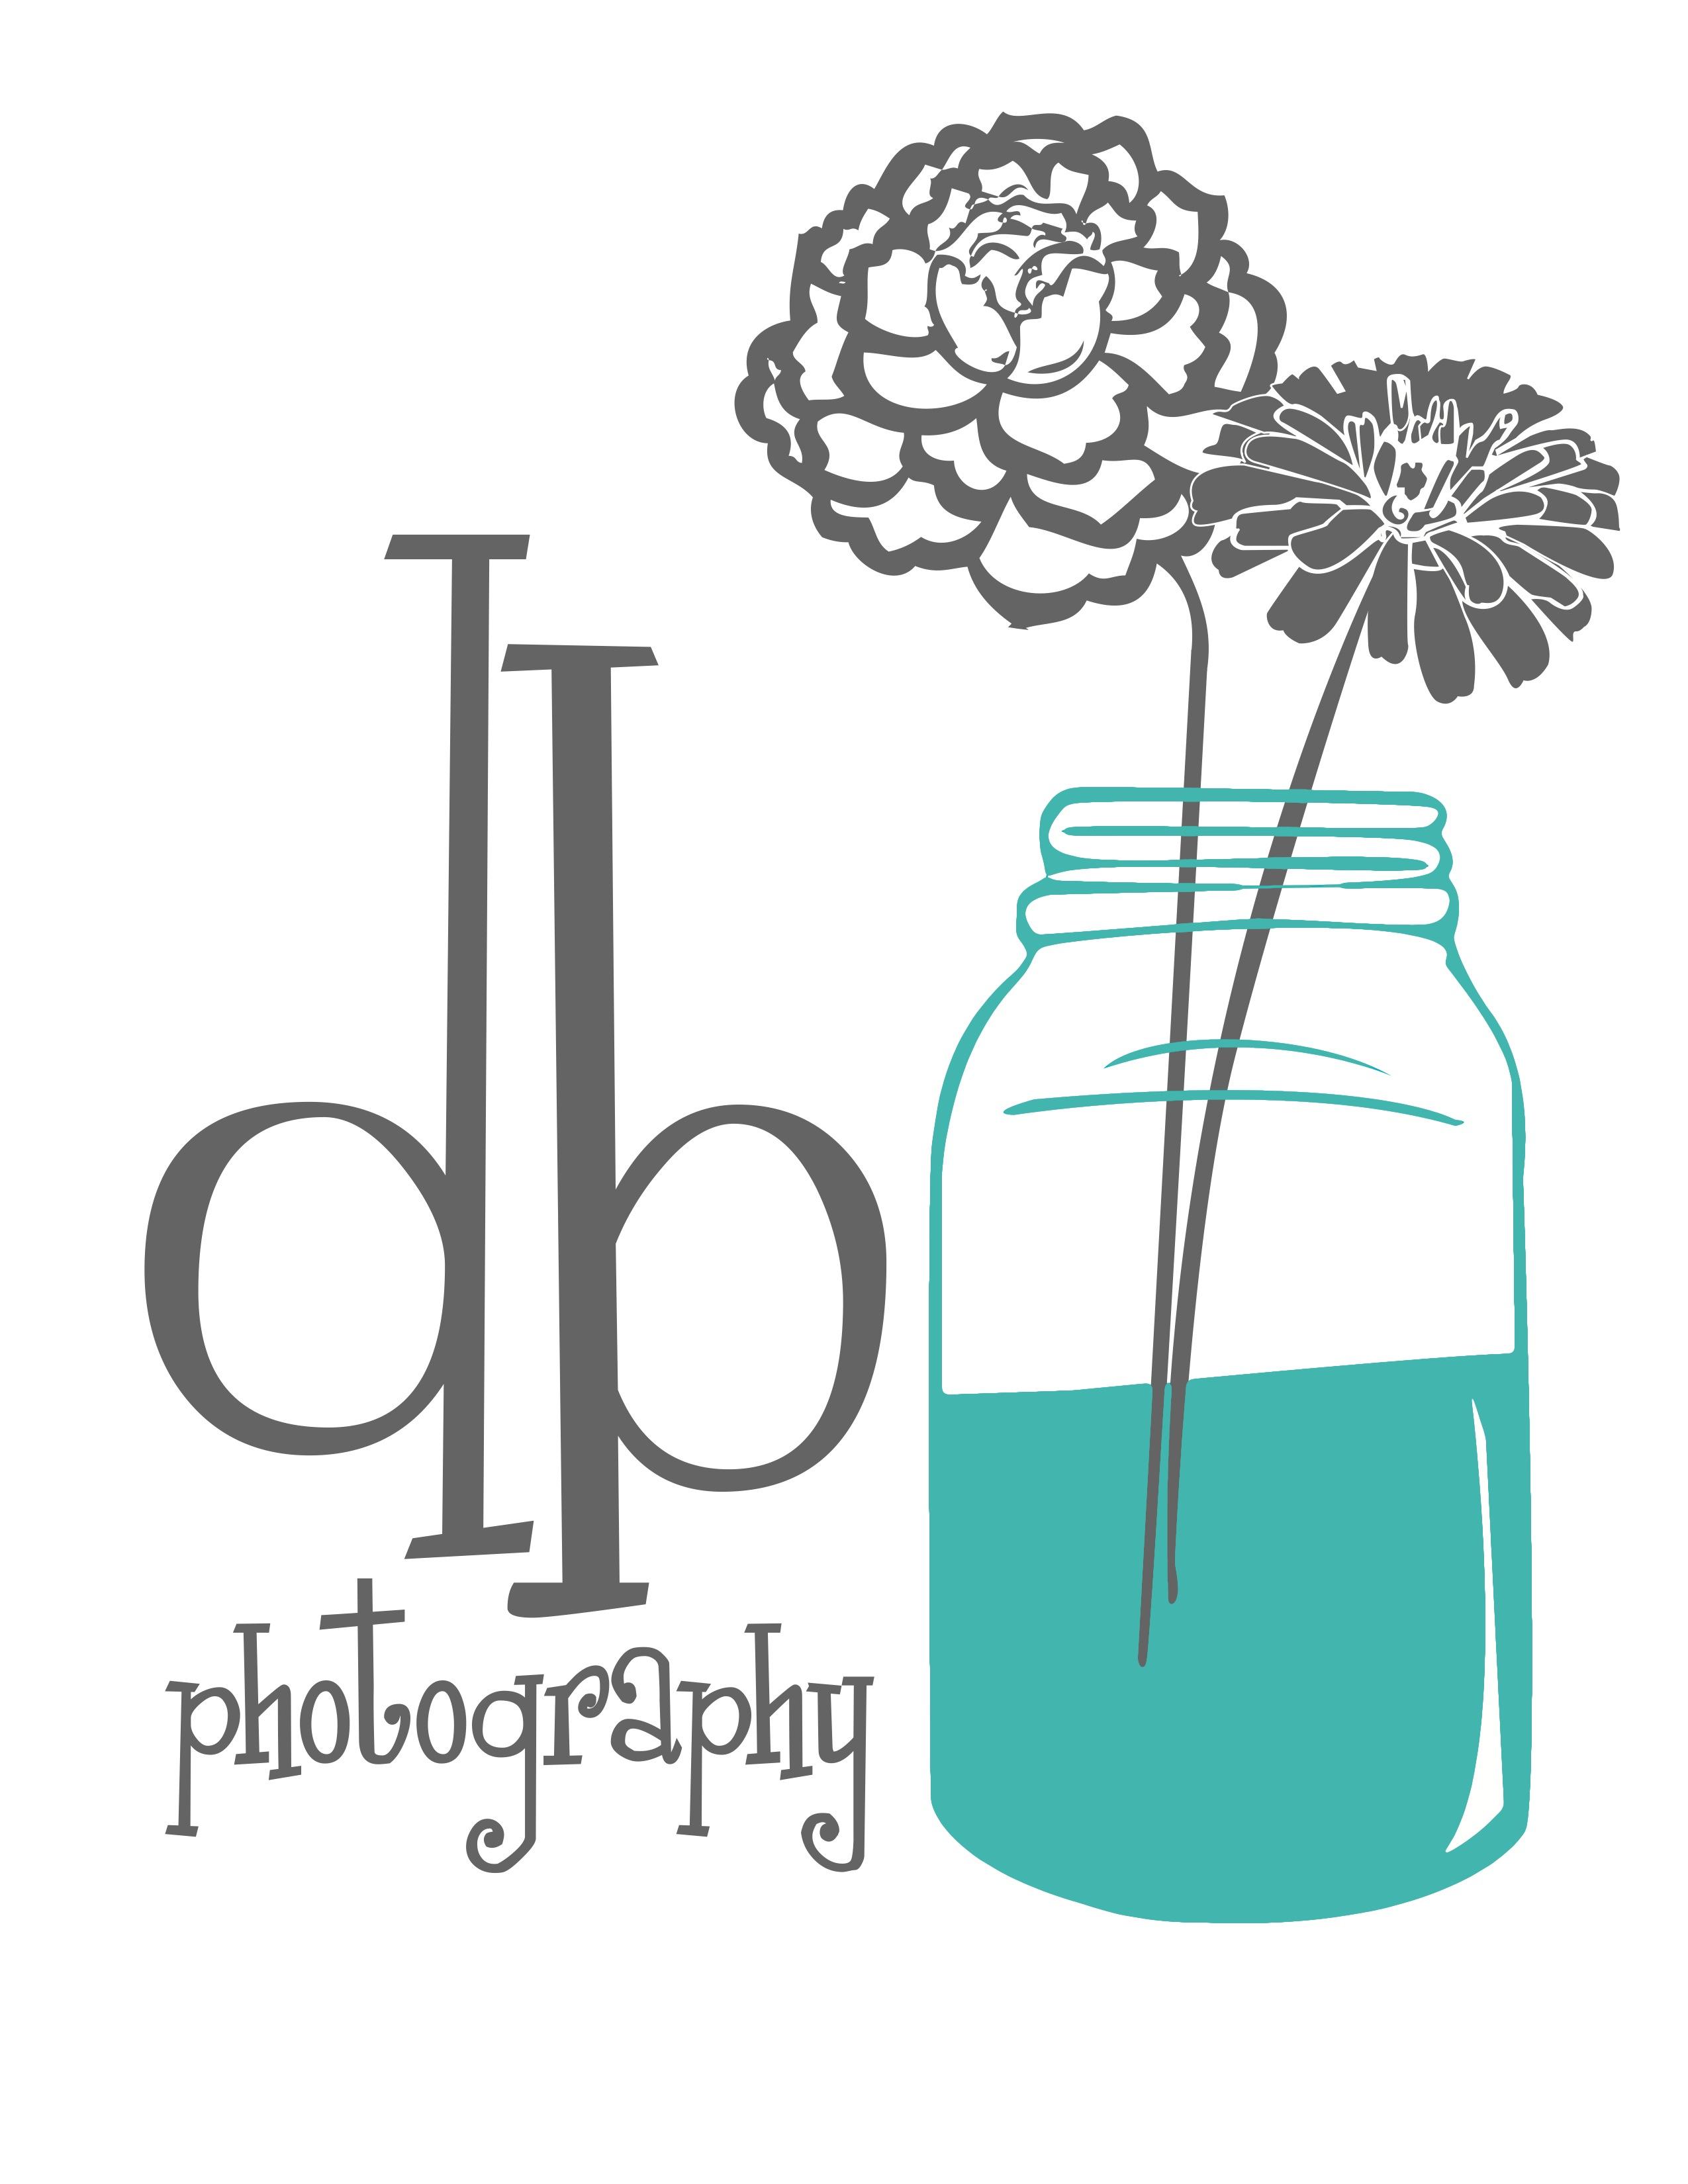 db photography